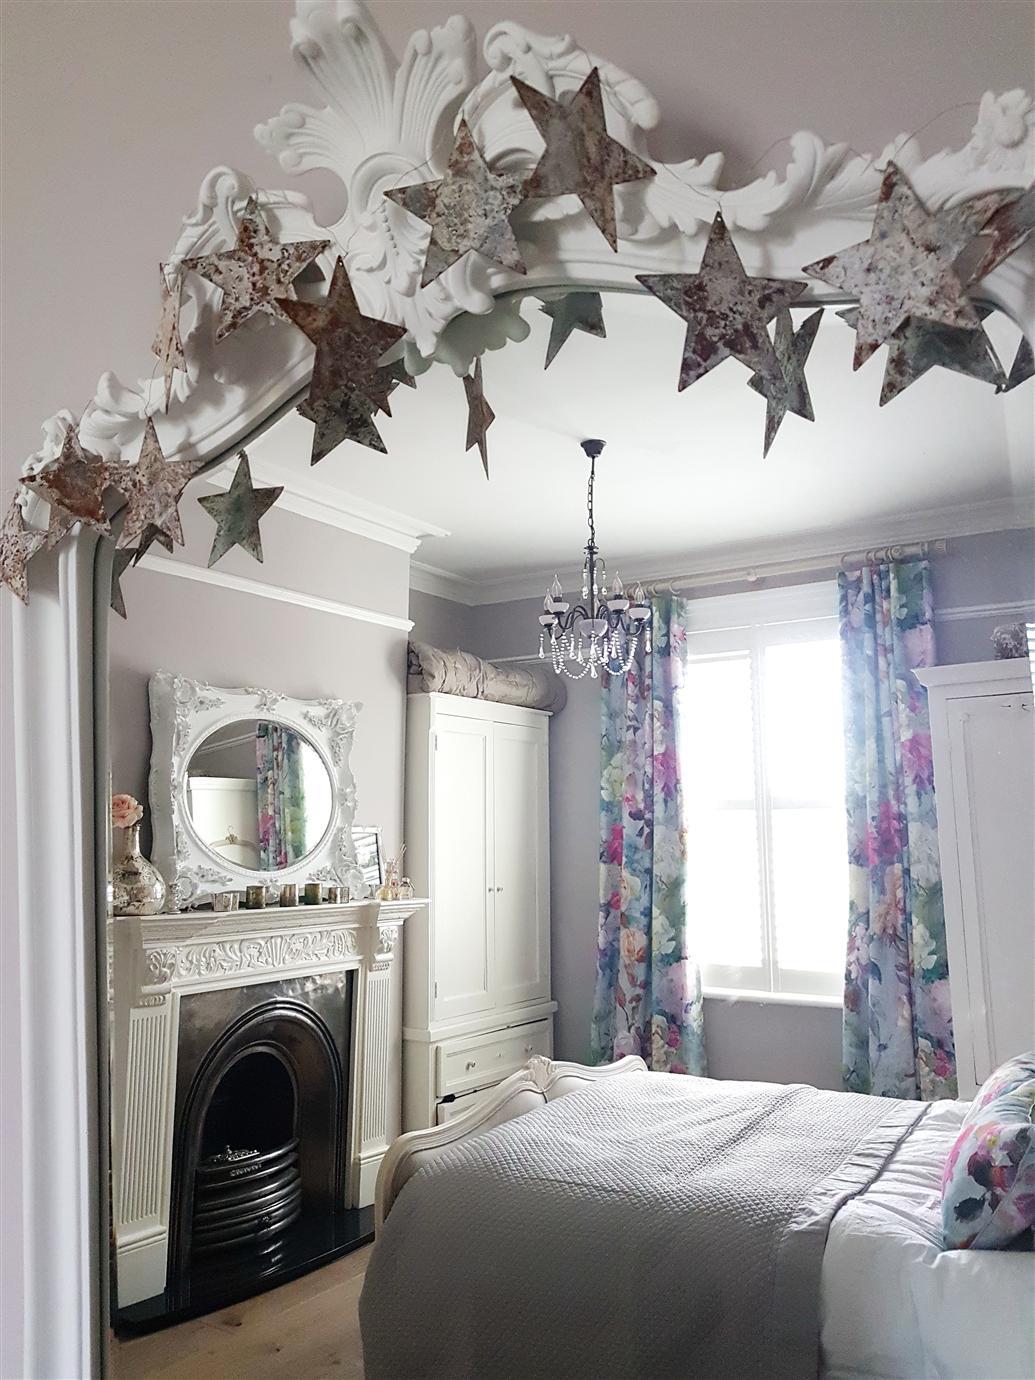 farrow ball peignoir 286 estate emulsion 2 5 eparket. Black Bedroom Furniture Sets. Home Design Ideas